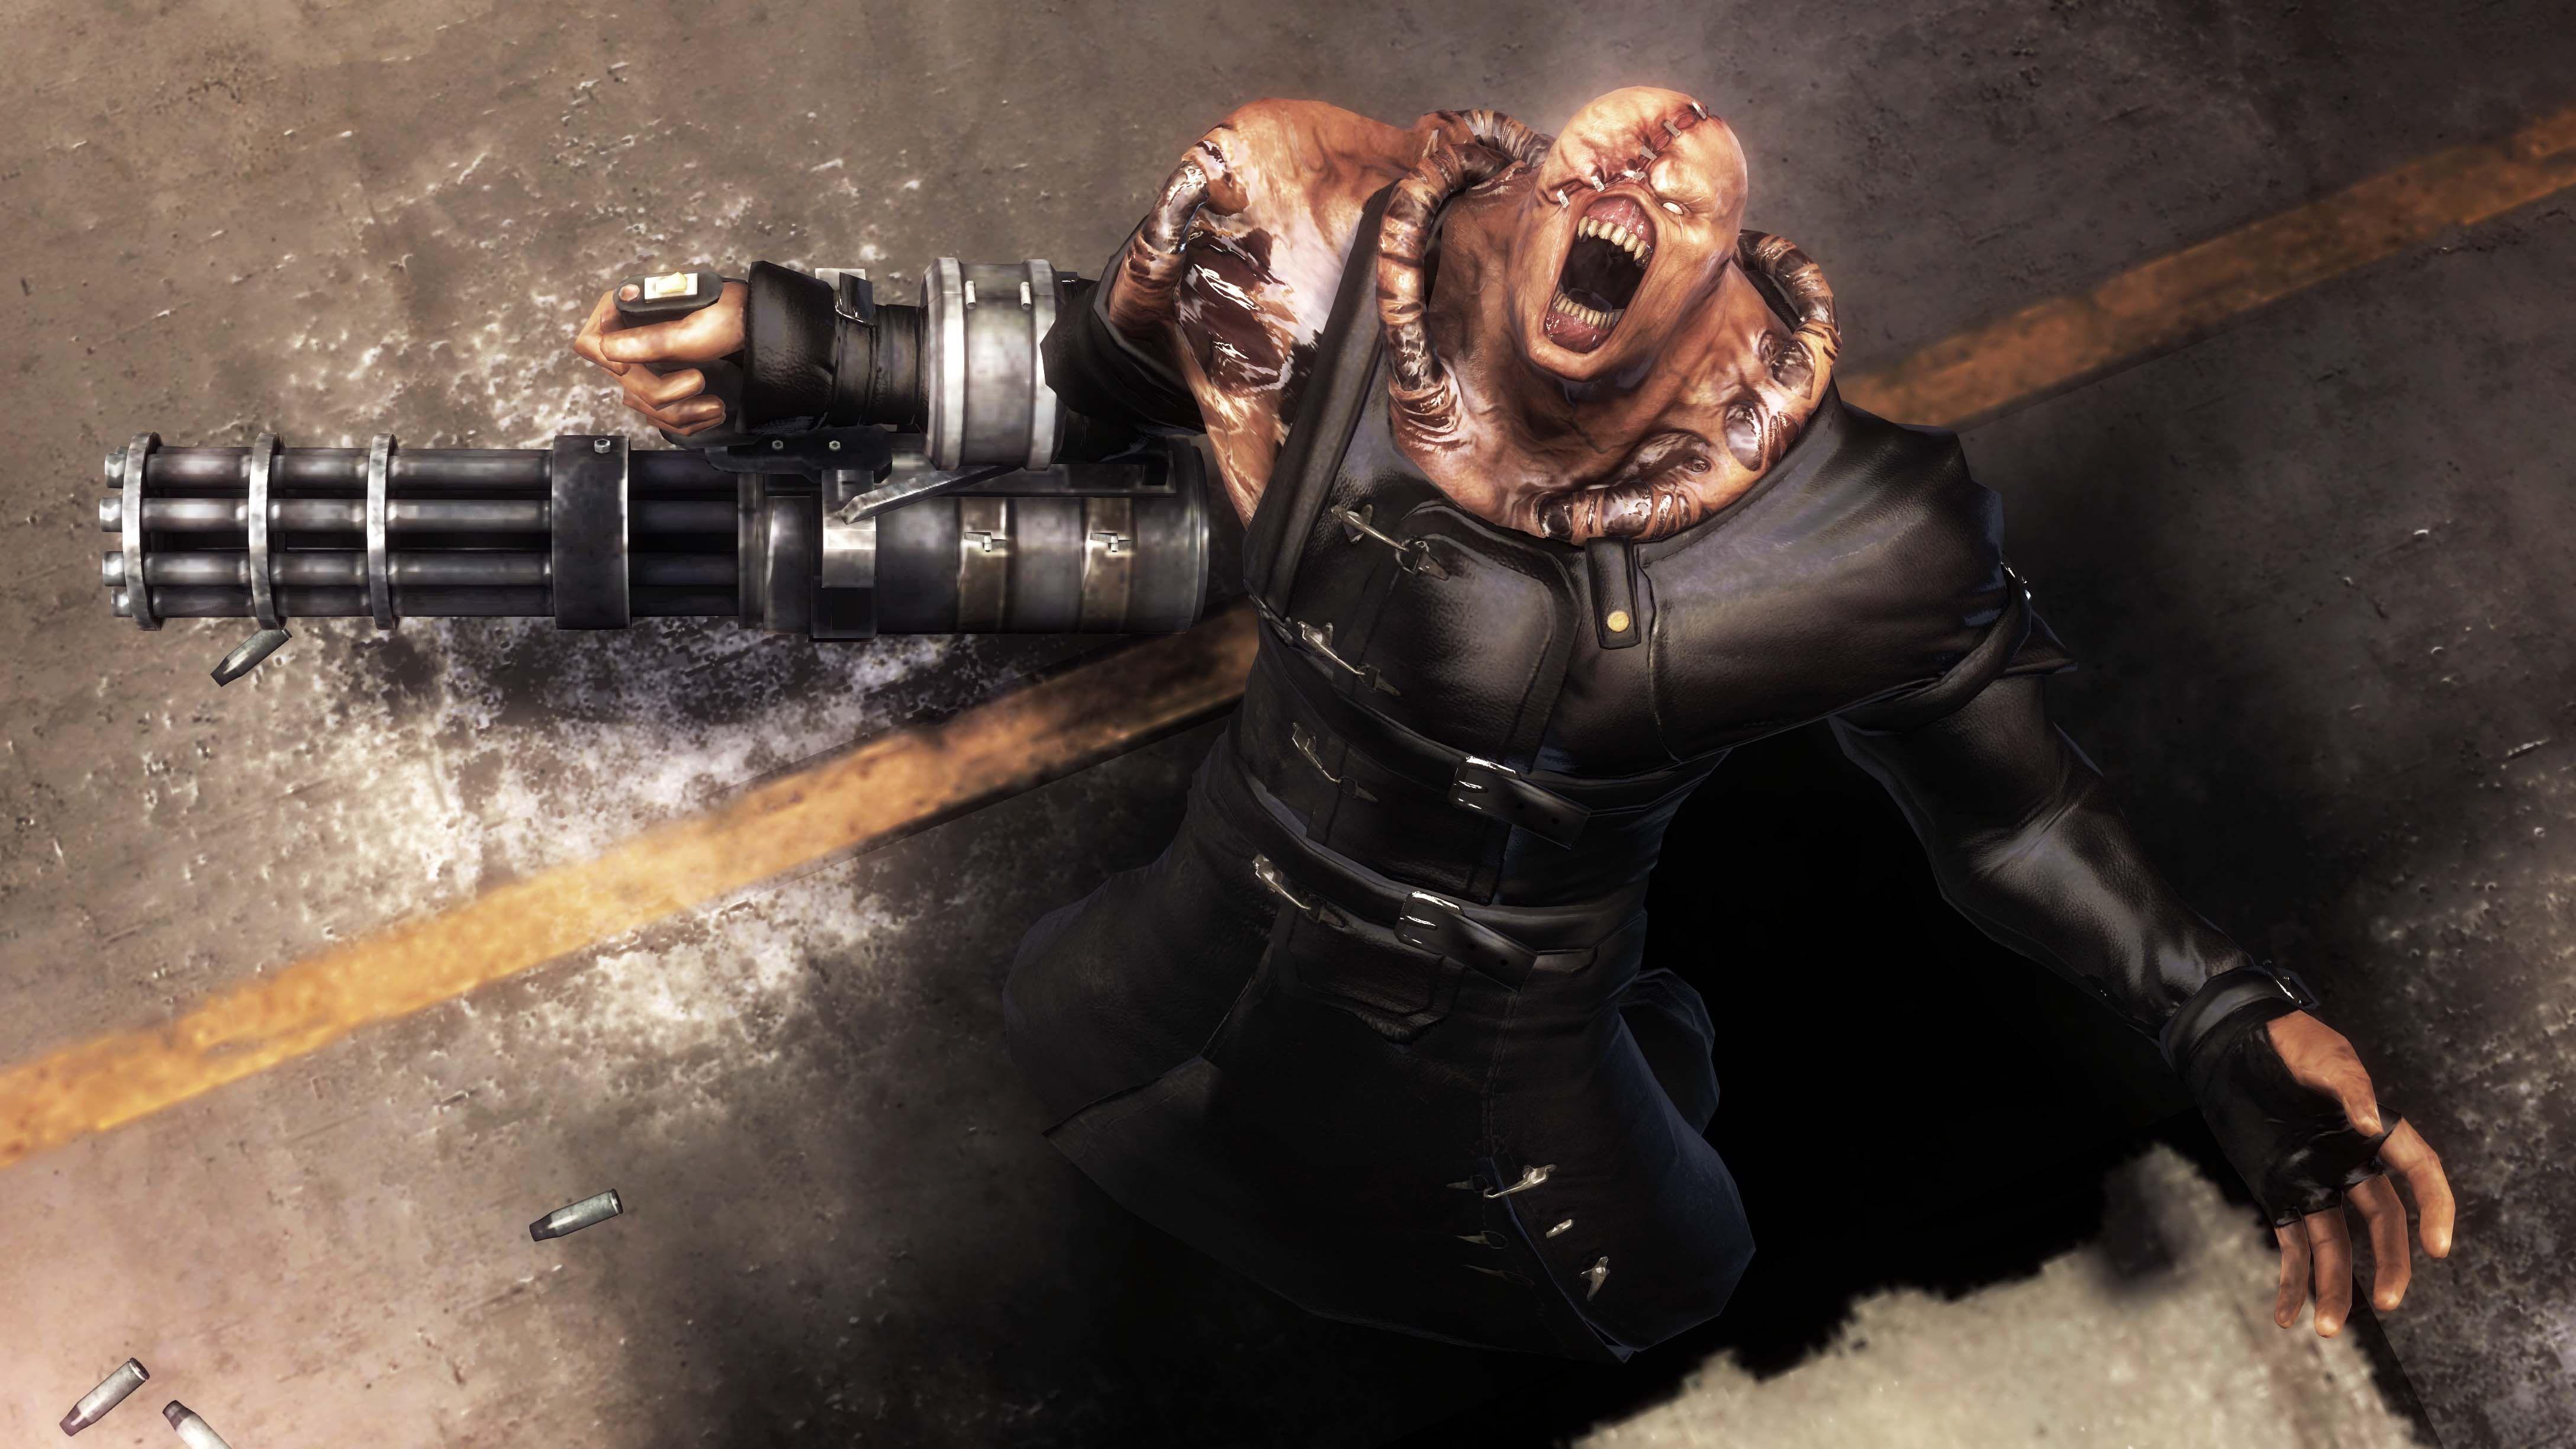 Pin by György Csécsei on Stb | Resident evil, Resident evil game